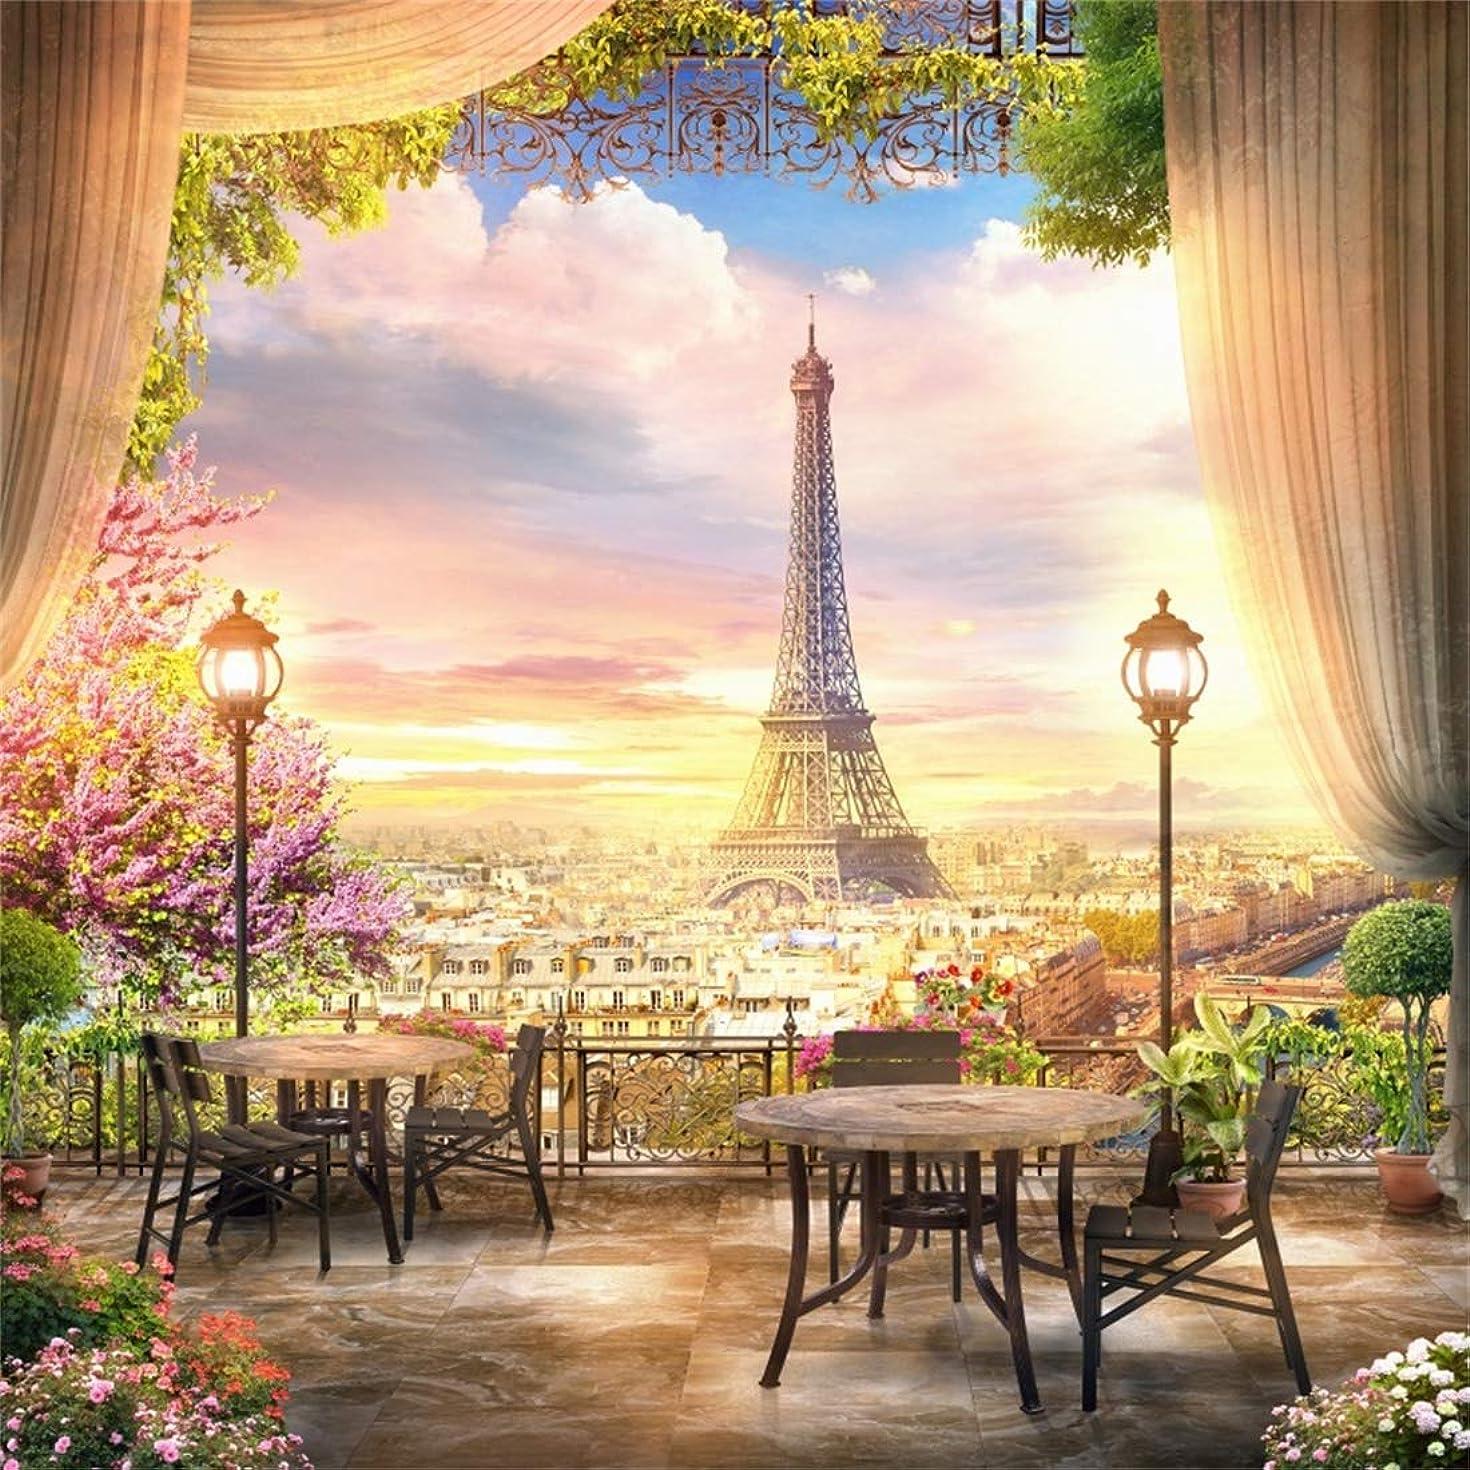 Yeele 4x4ft Photography Background French Dreamlike Paris Eiffel Tower Balcony Curtain Flowers City View Garden Tea Party Decoration Terrace Veranda Lamp Photo Backdrop Booth Studio Prop